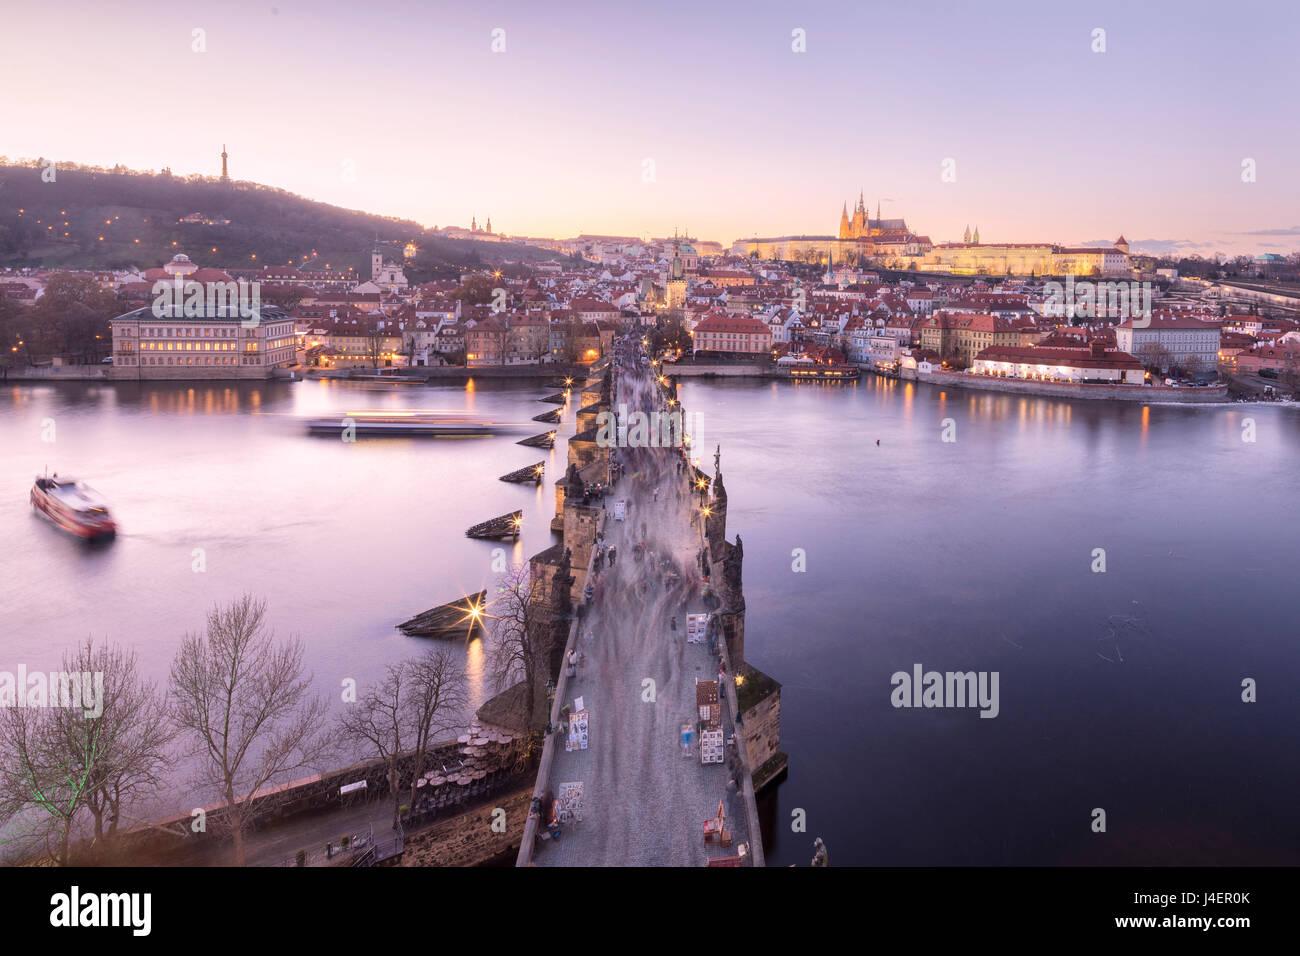 Vltava River and Charles Bridge at sunset, UNESCO World Heritage Site, Prague, Czech Republic, Europe - Stock Image